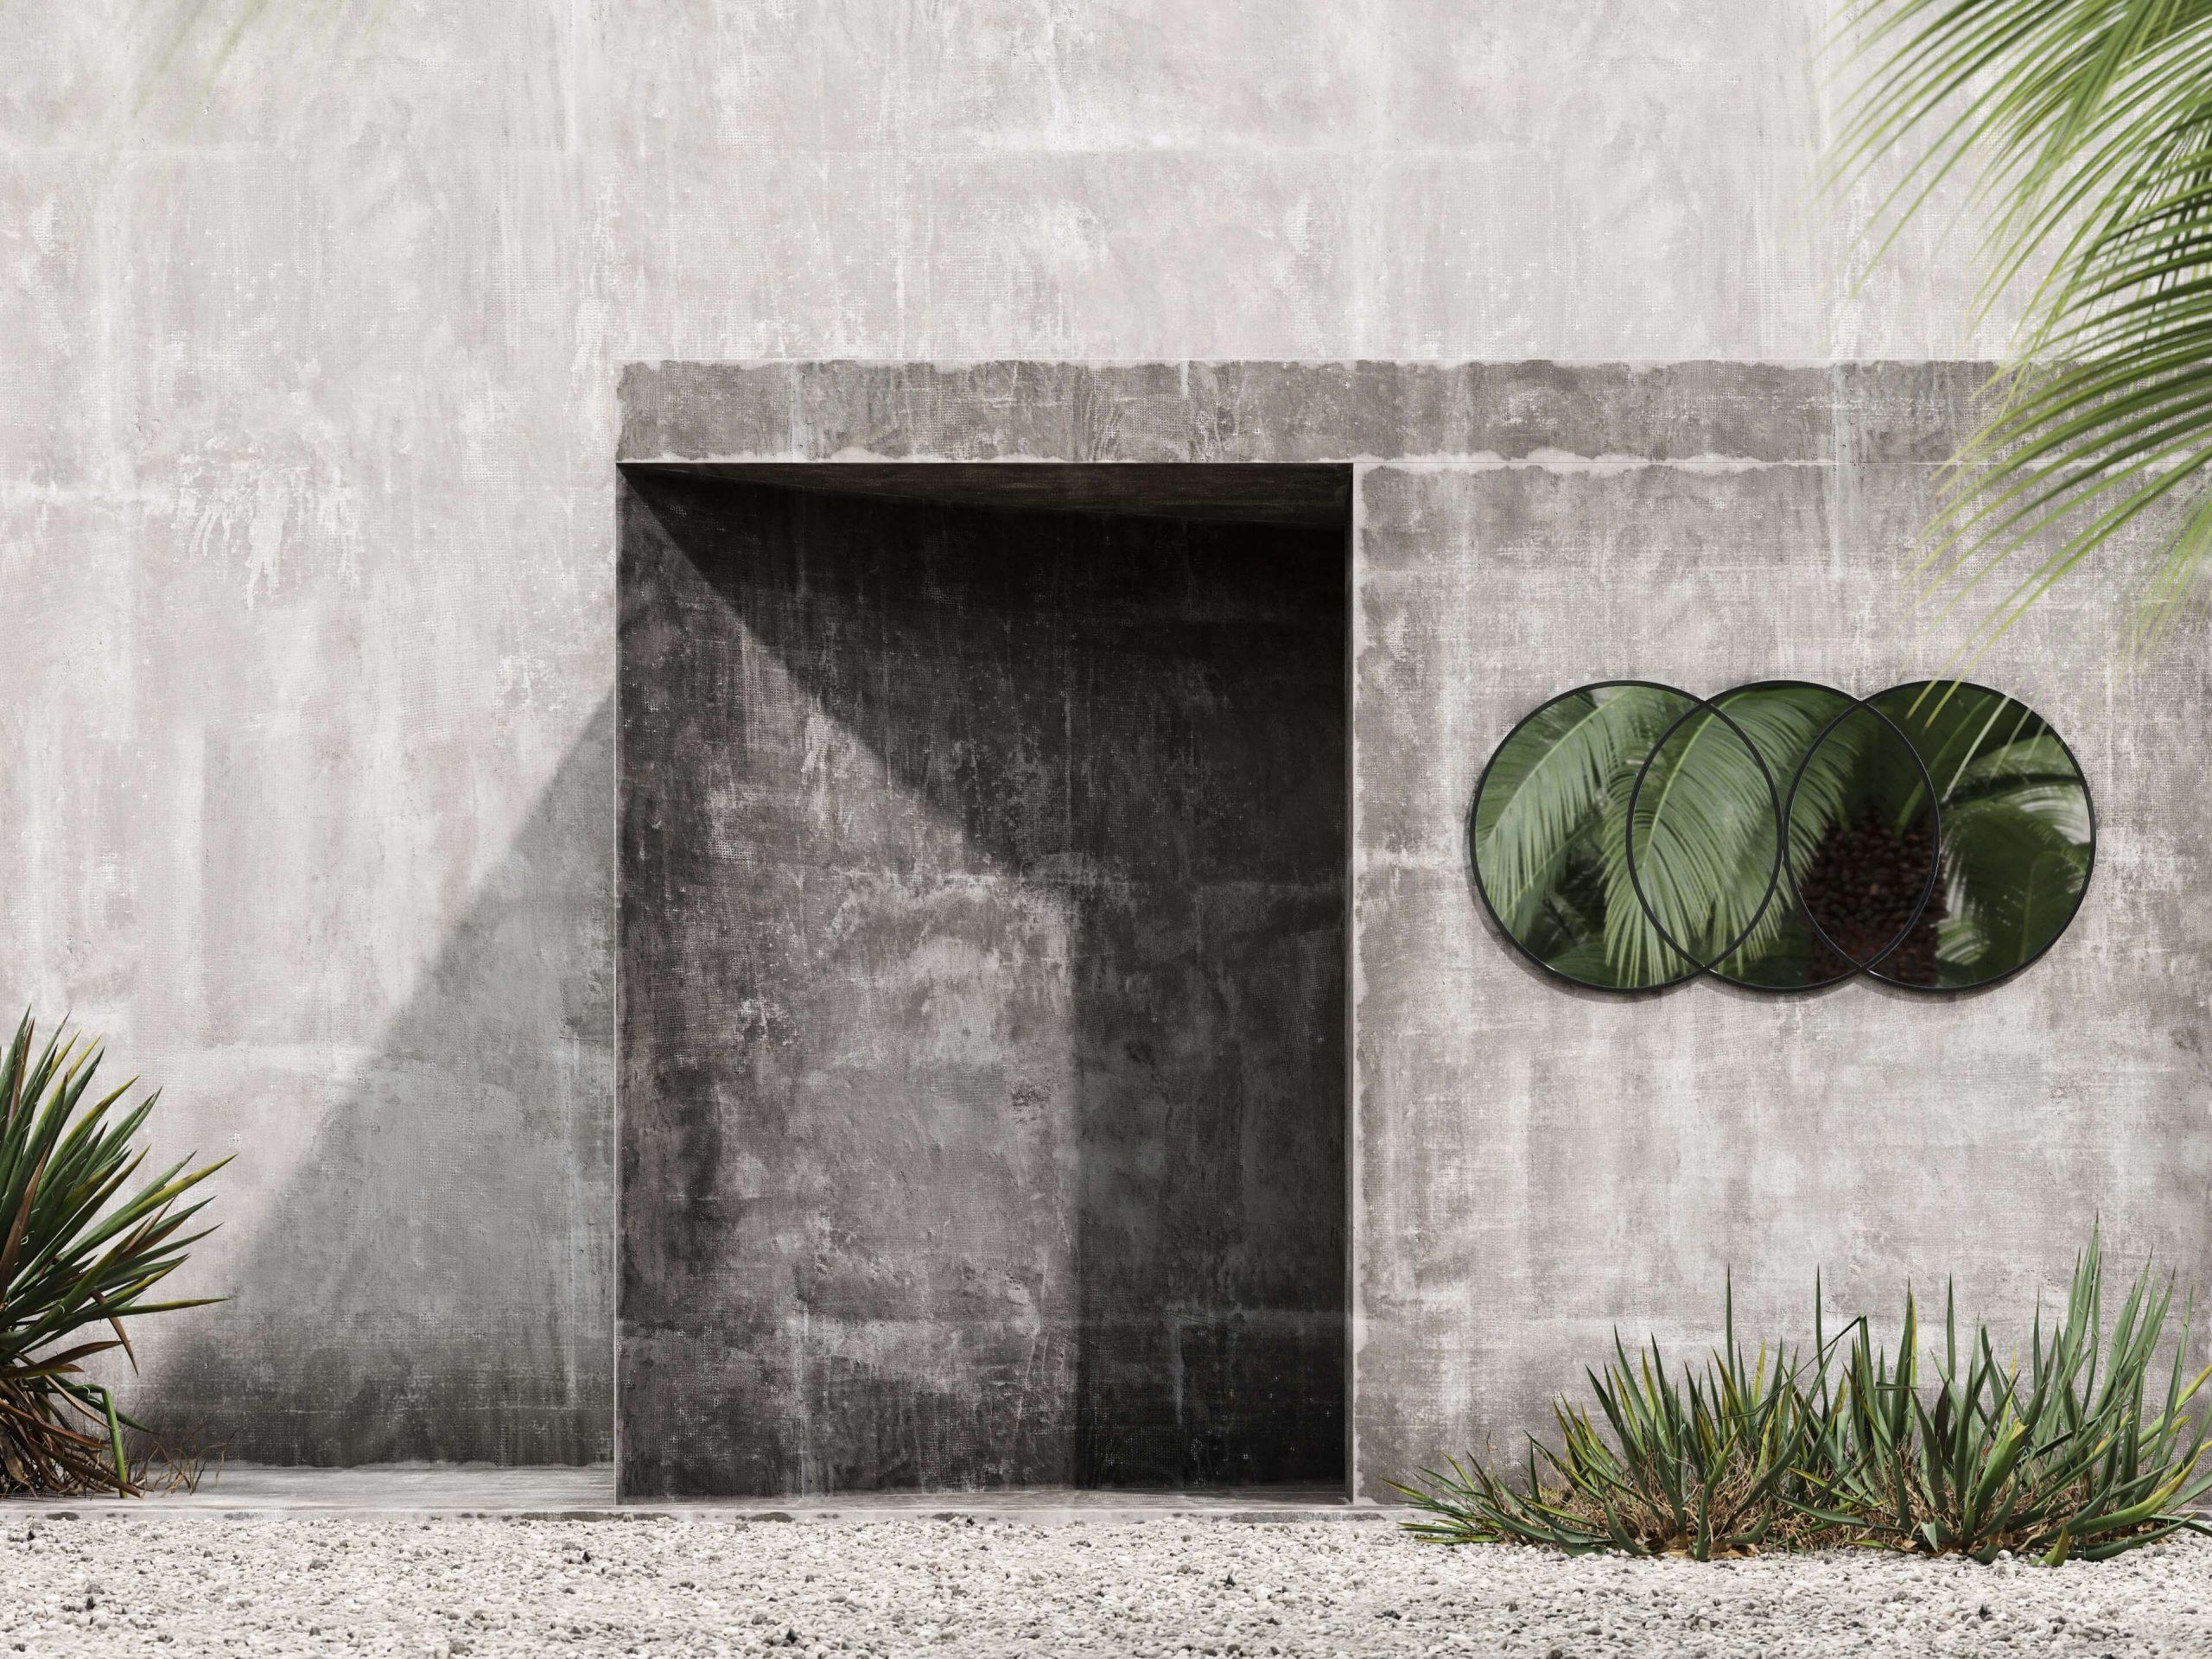 espelho-sienna-curved-design-livingroom-master-bedroom-velvet-domkapa-6